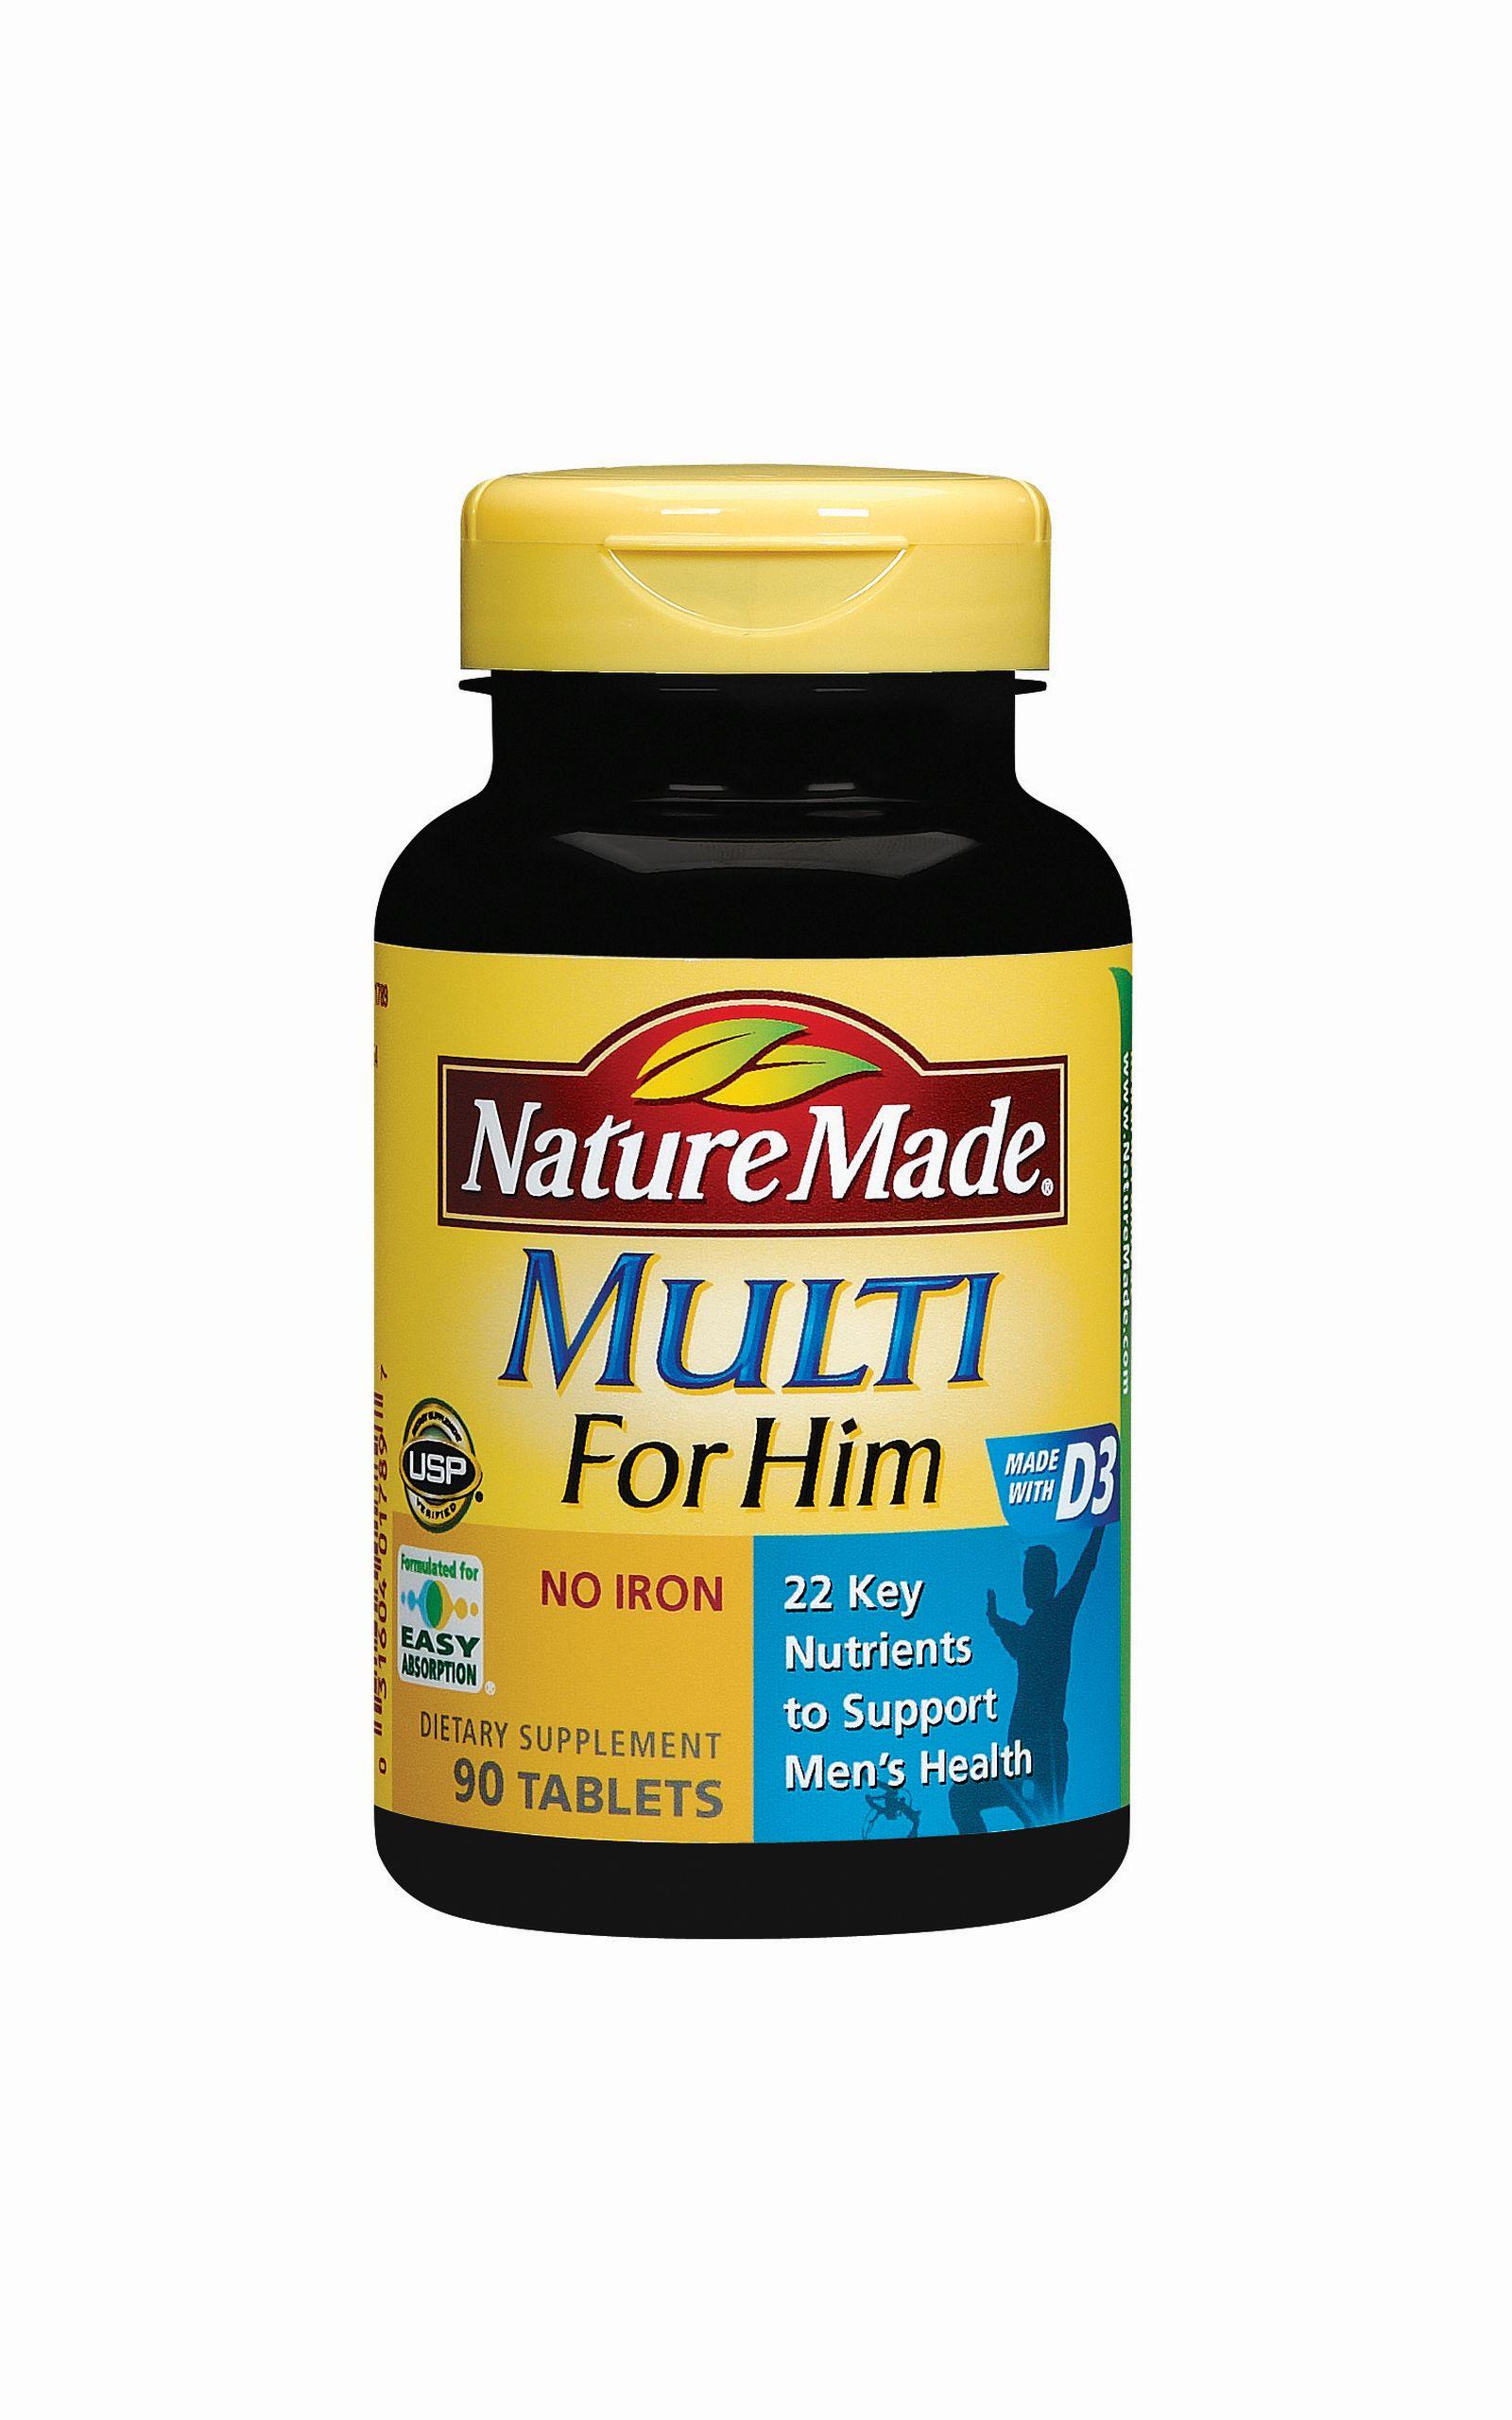 Nature made multi vitamins